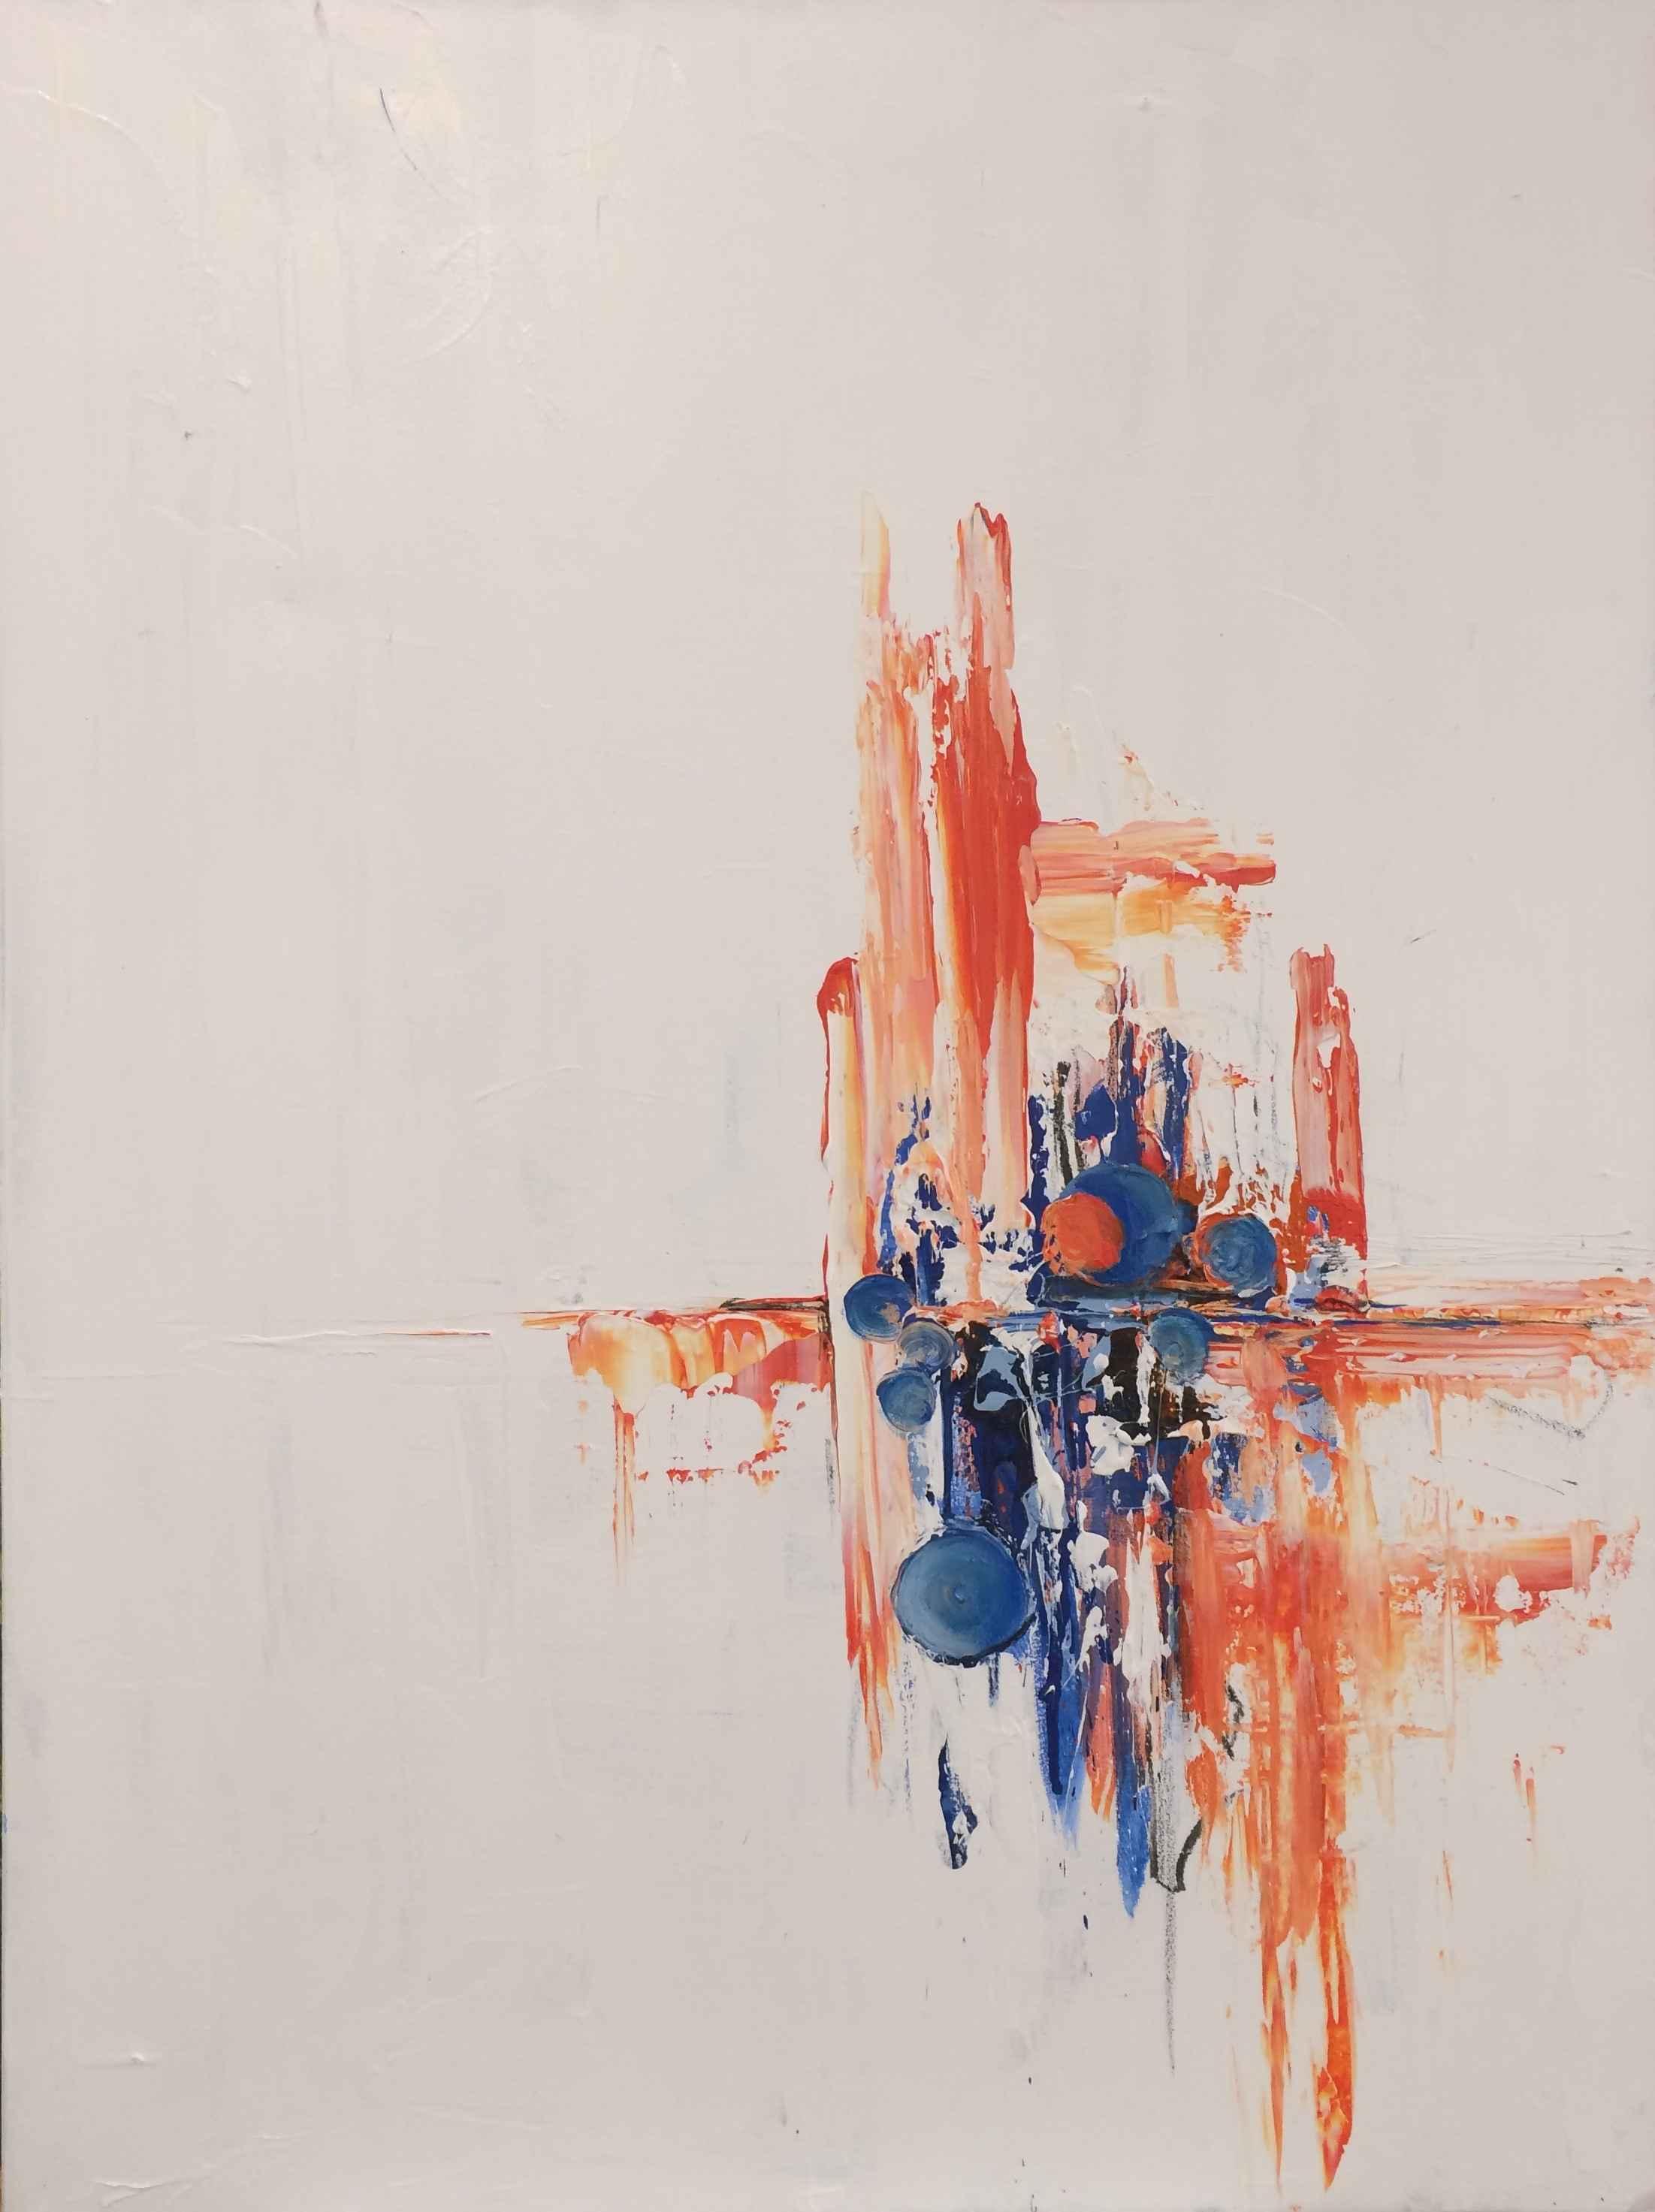 The Reflection of Sou... by  Steve Lyons - Masterpiece Online